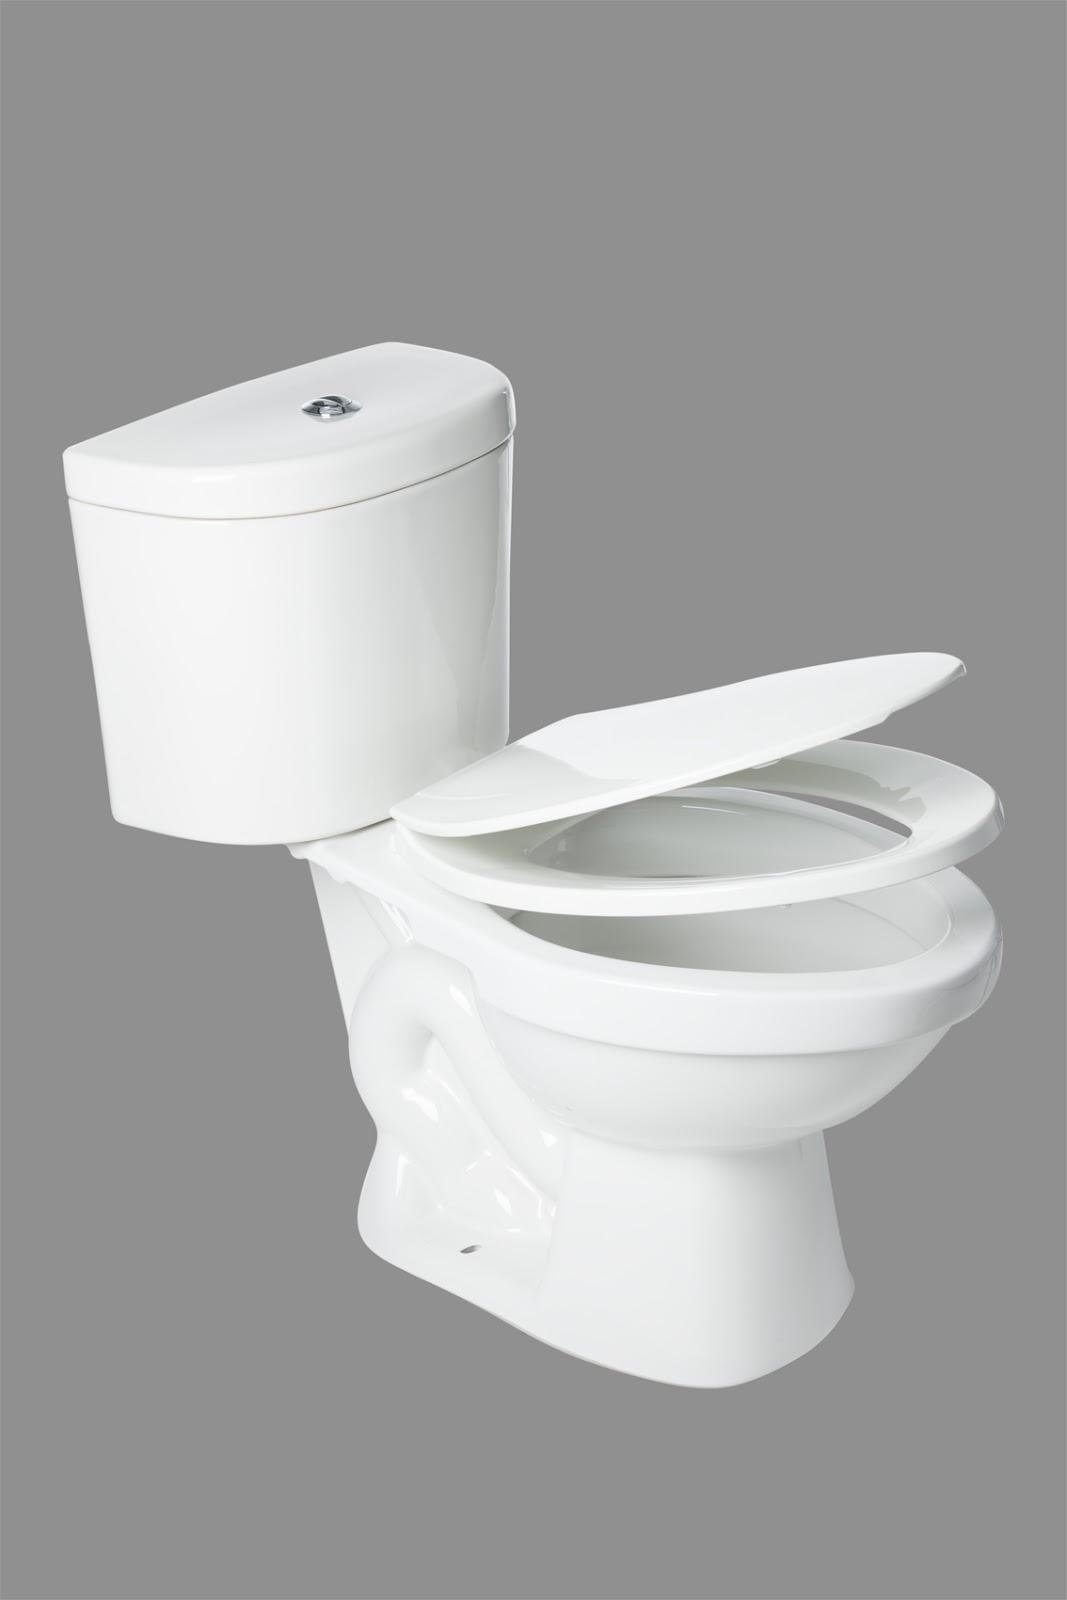 Servidor porcelana sanitaria sanitario avellano plus for Porcelana sanitaria